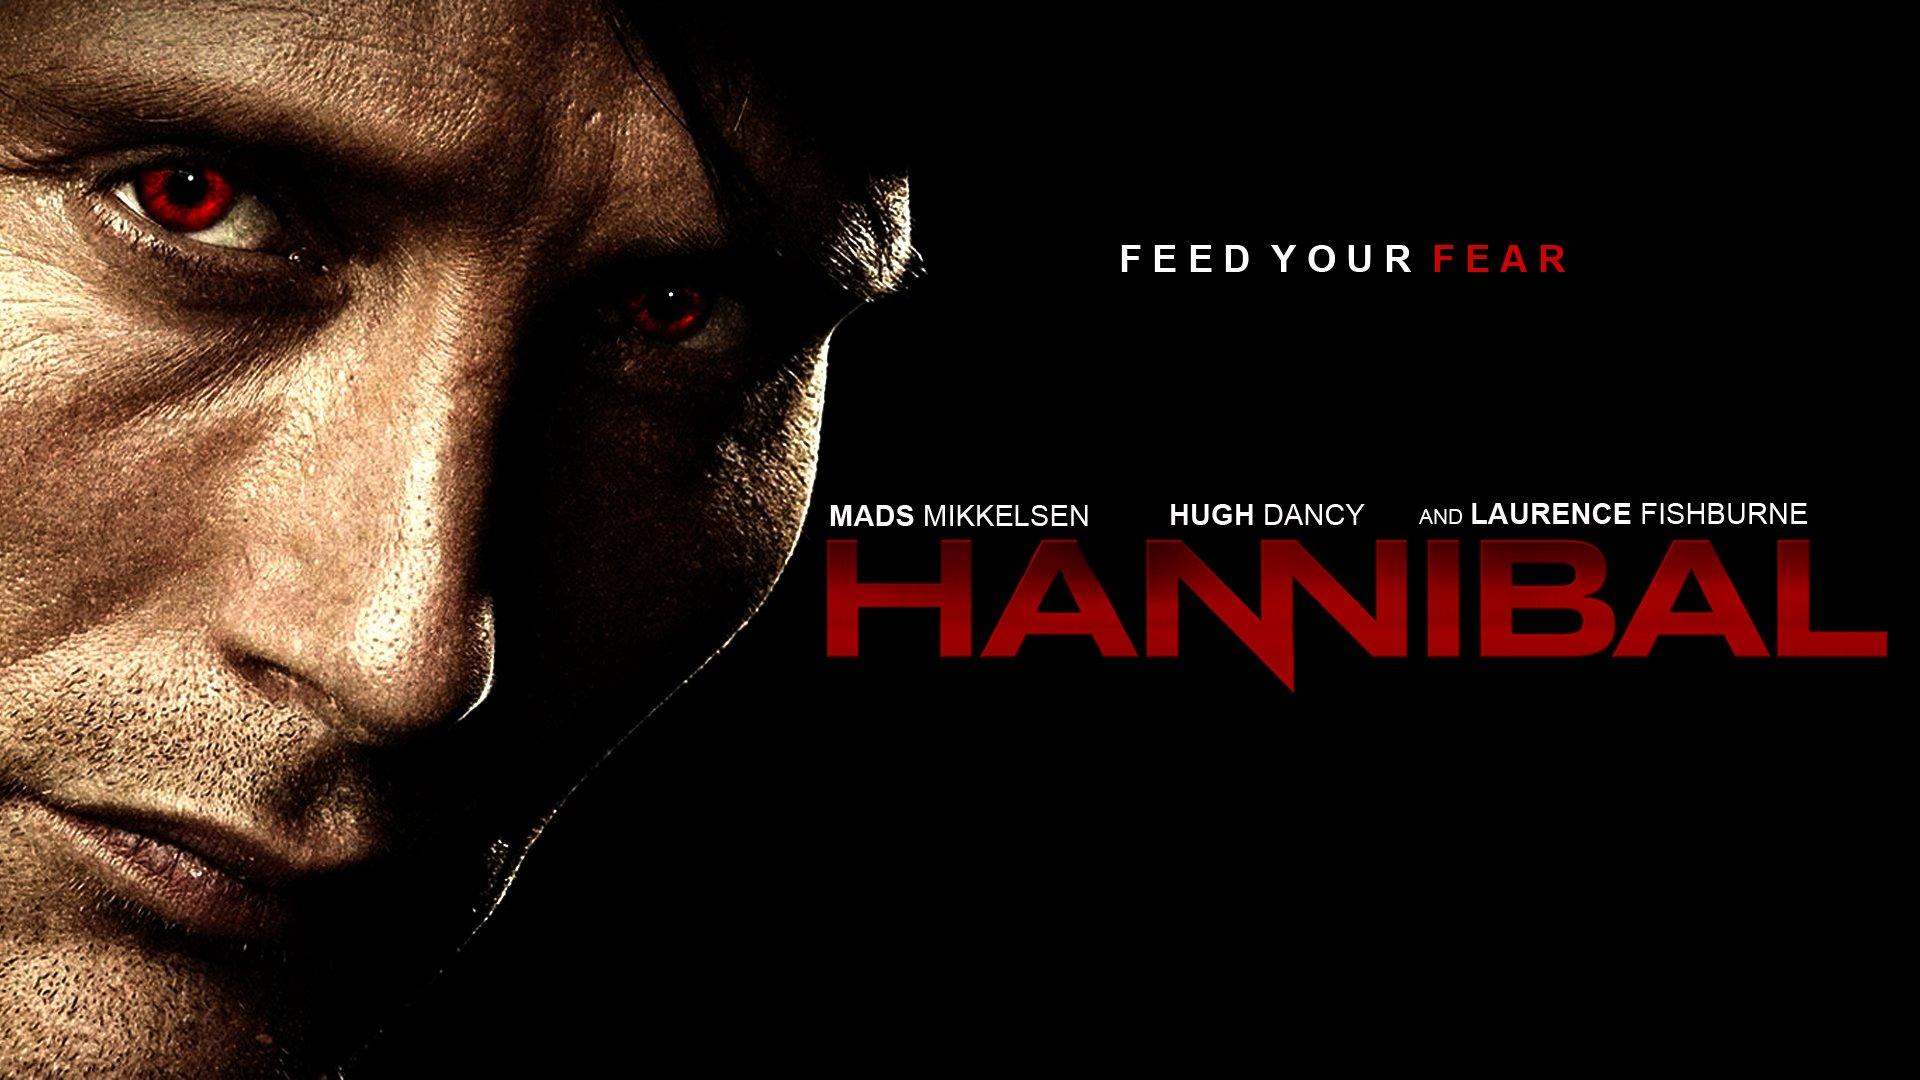 127 Hannibal HD Wallpapers